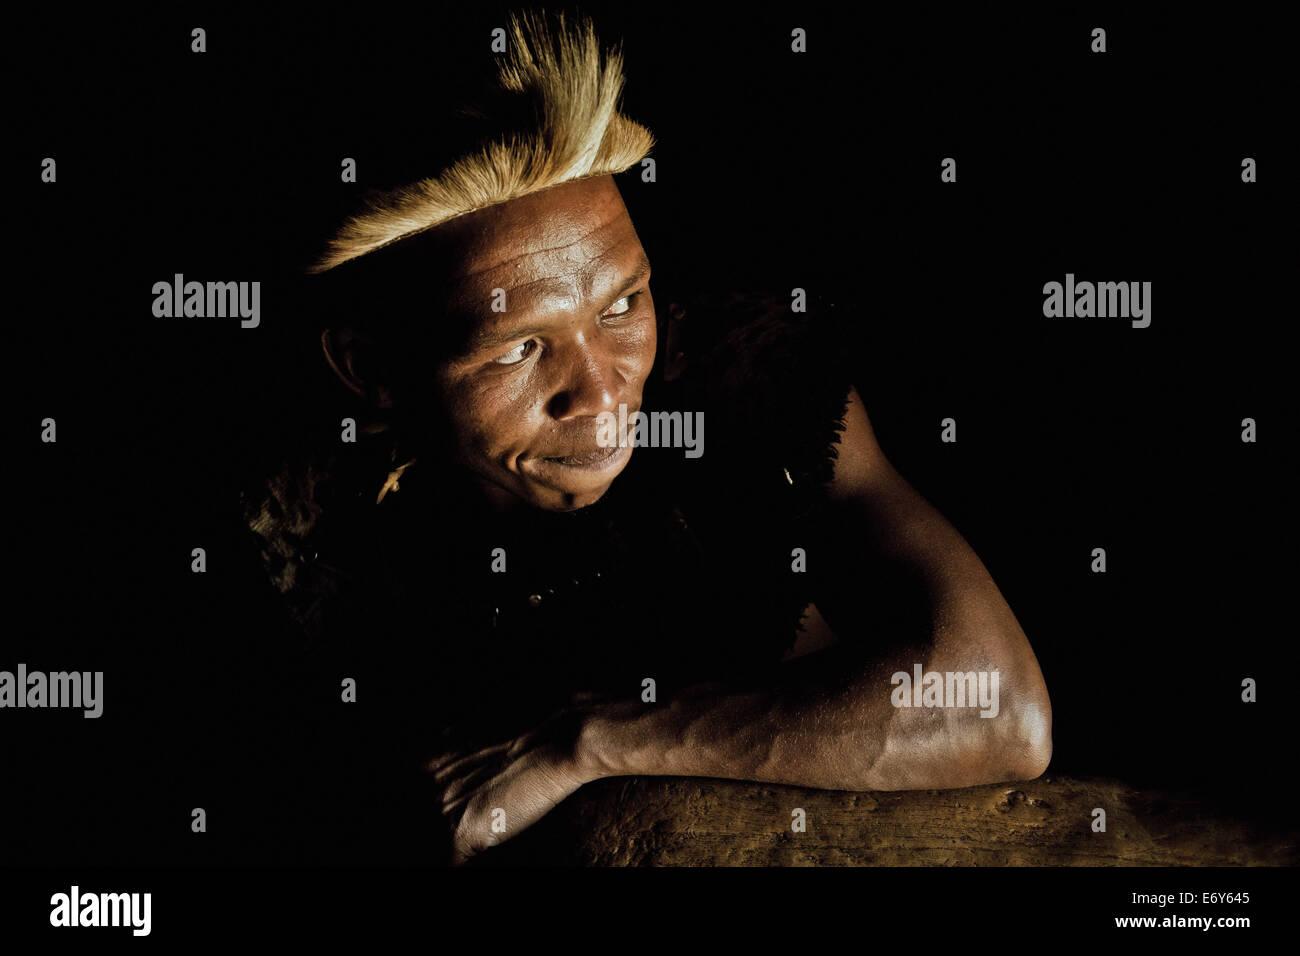 Man of the Zulu tribe, KwaZulu-Natal, South Africa, Africa - Stock Image